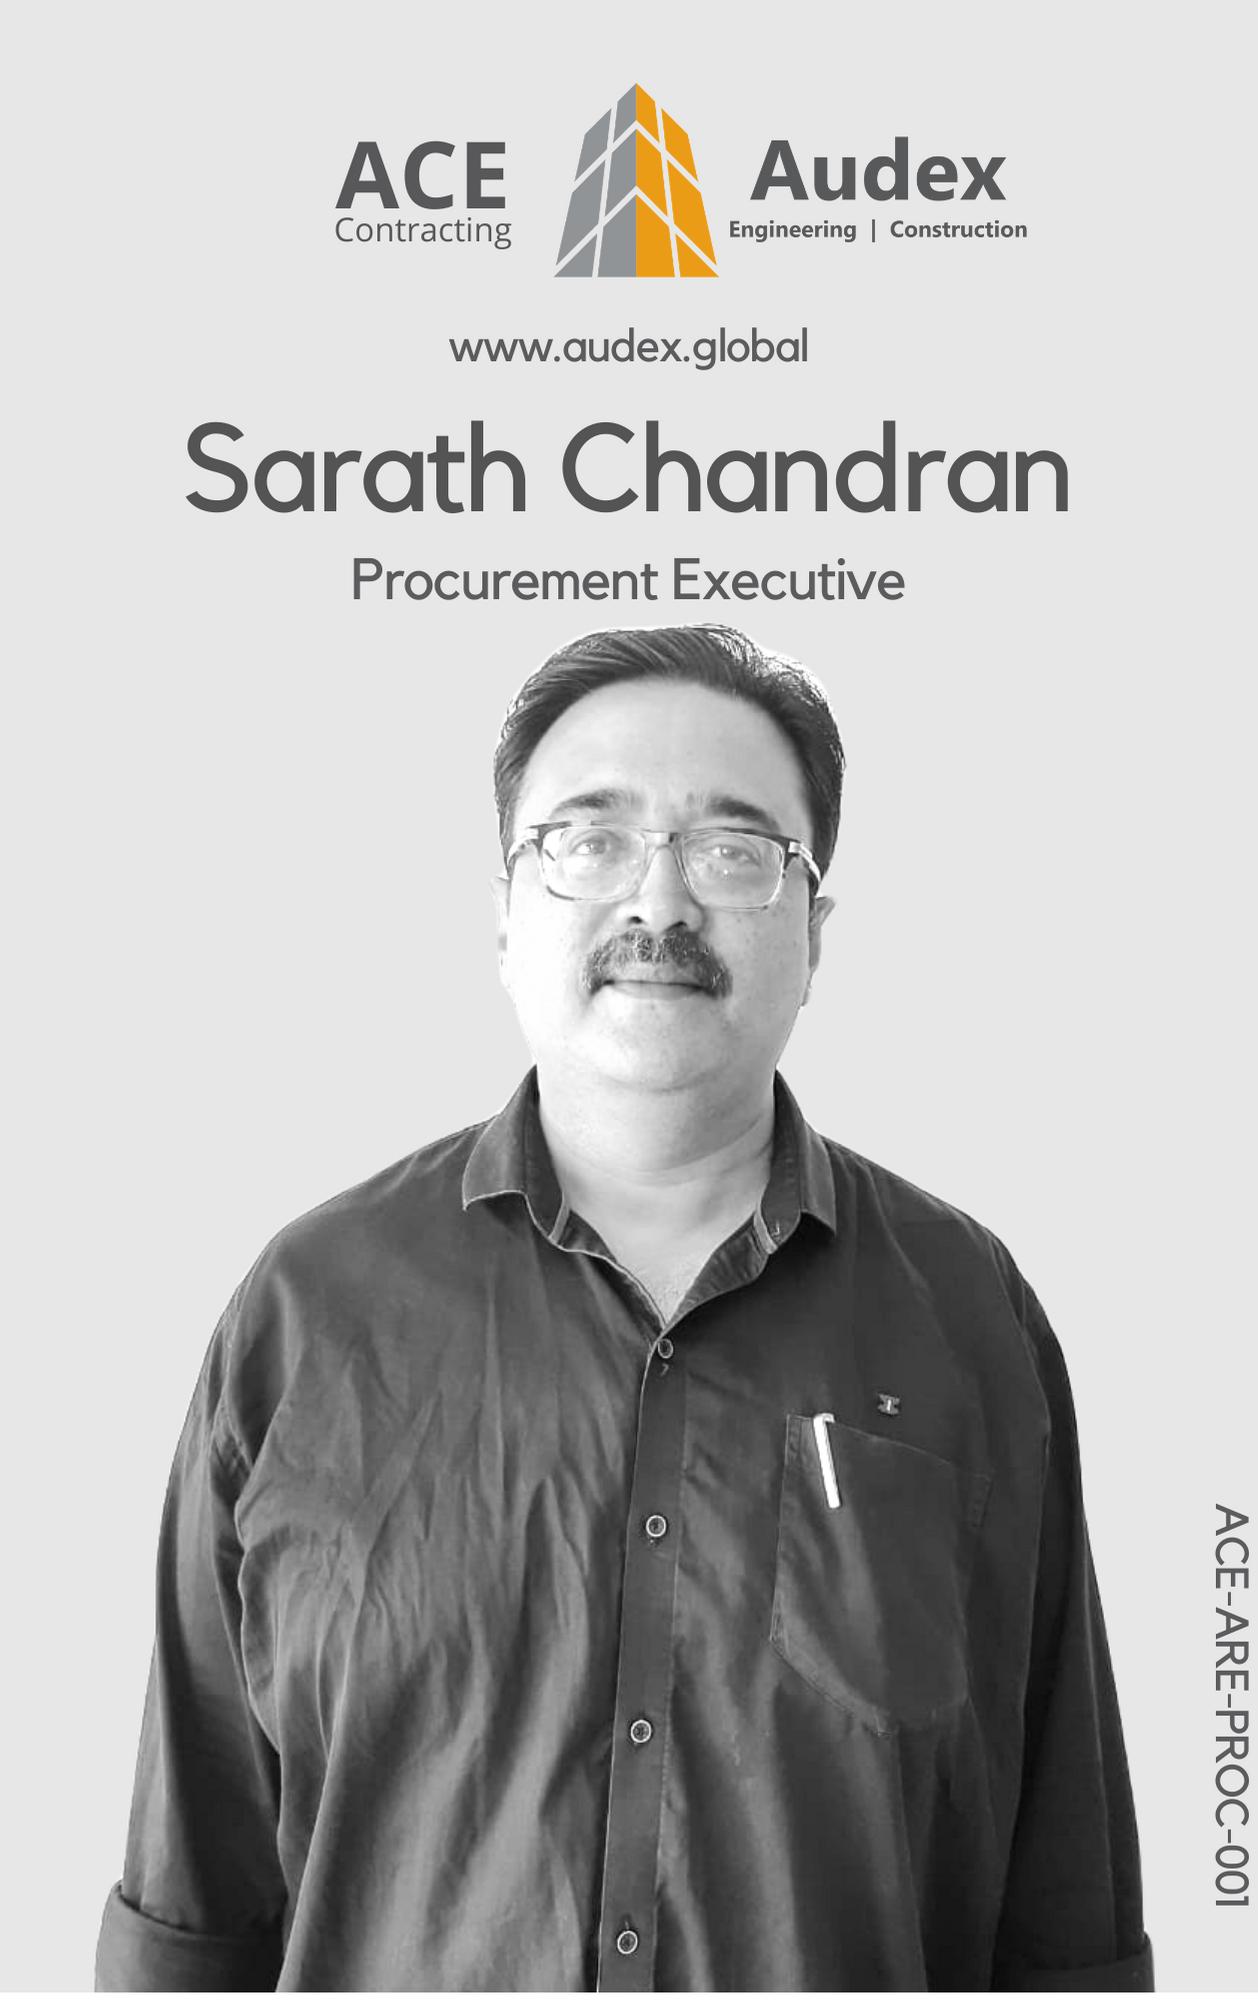 Sarath Chandran